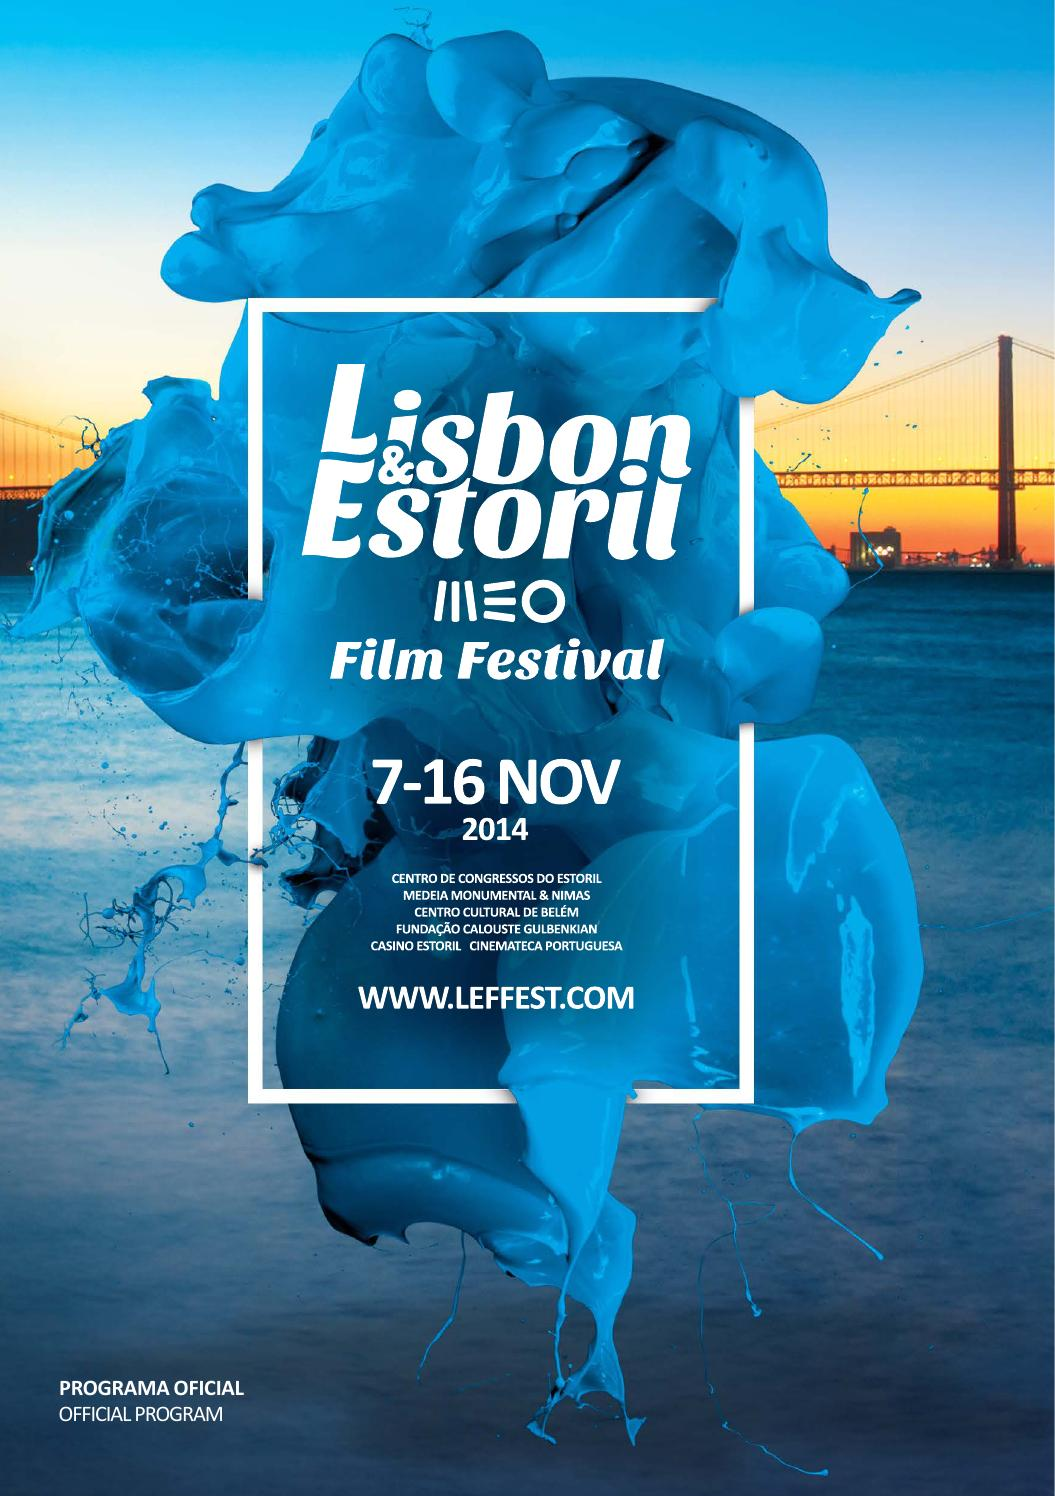 a5ac4d63272 Catálogo Lisbon   Estoril Film Festival 2014 by Lisbon   Estoril Film  Festival - issuu